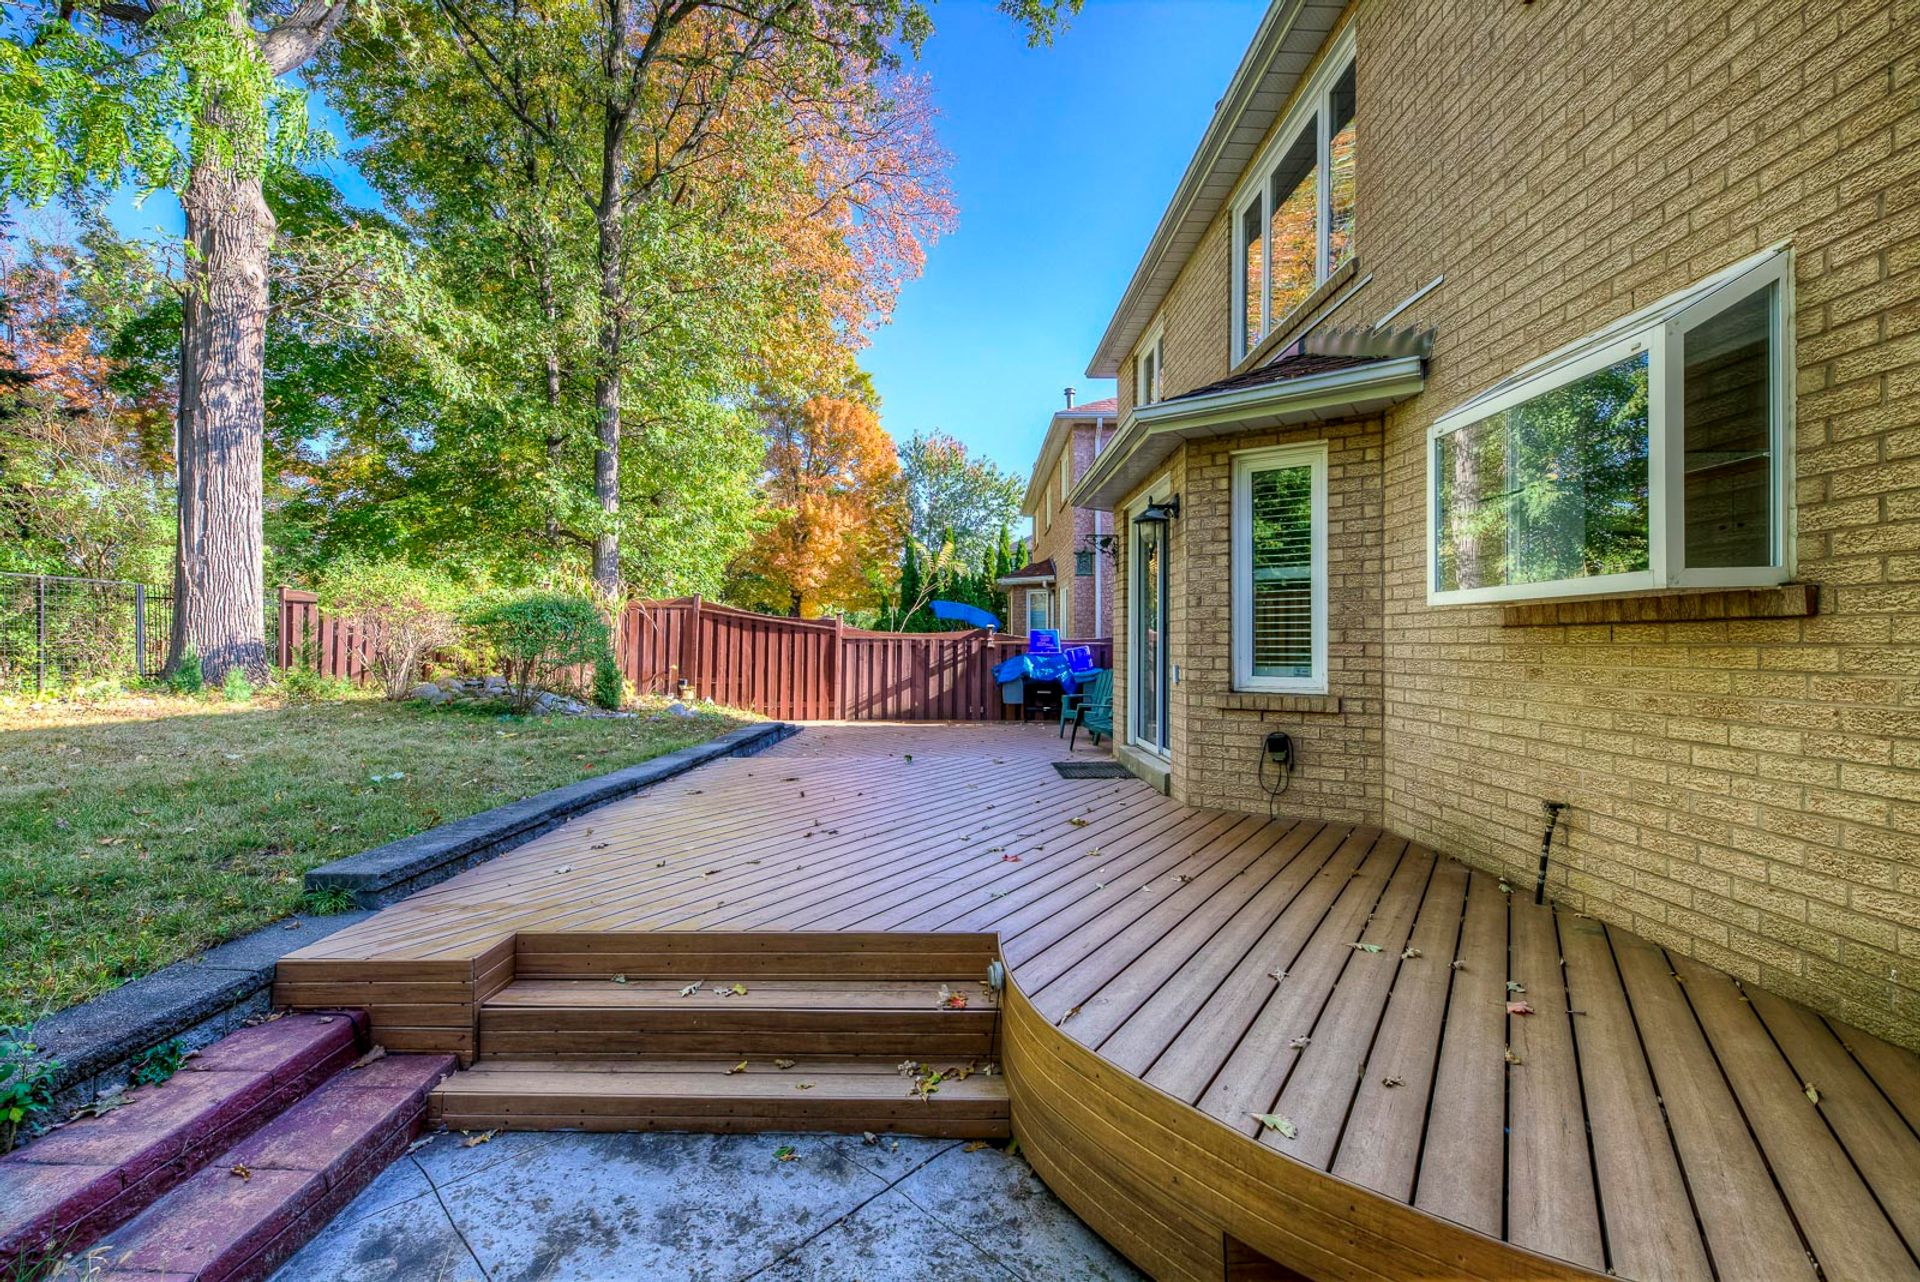 Backyard Bedroom - 1522 Estes Cres, Mississauga - Elite3 & Team at 1522 Estes Crescent, East Credit, Mississauga